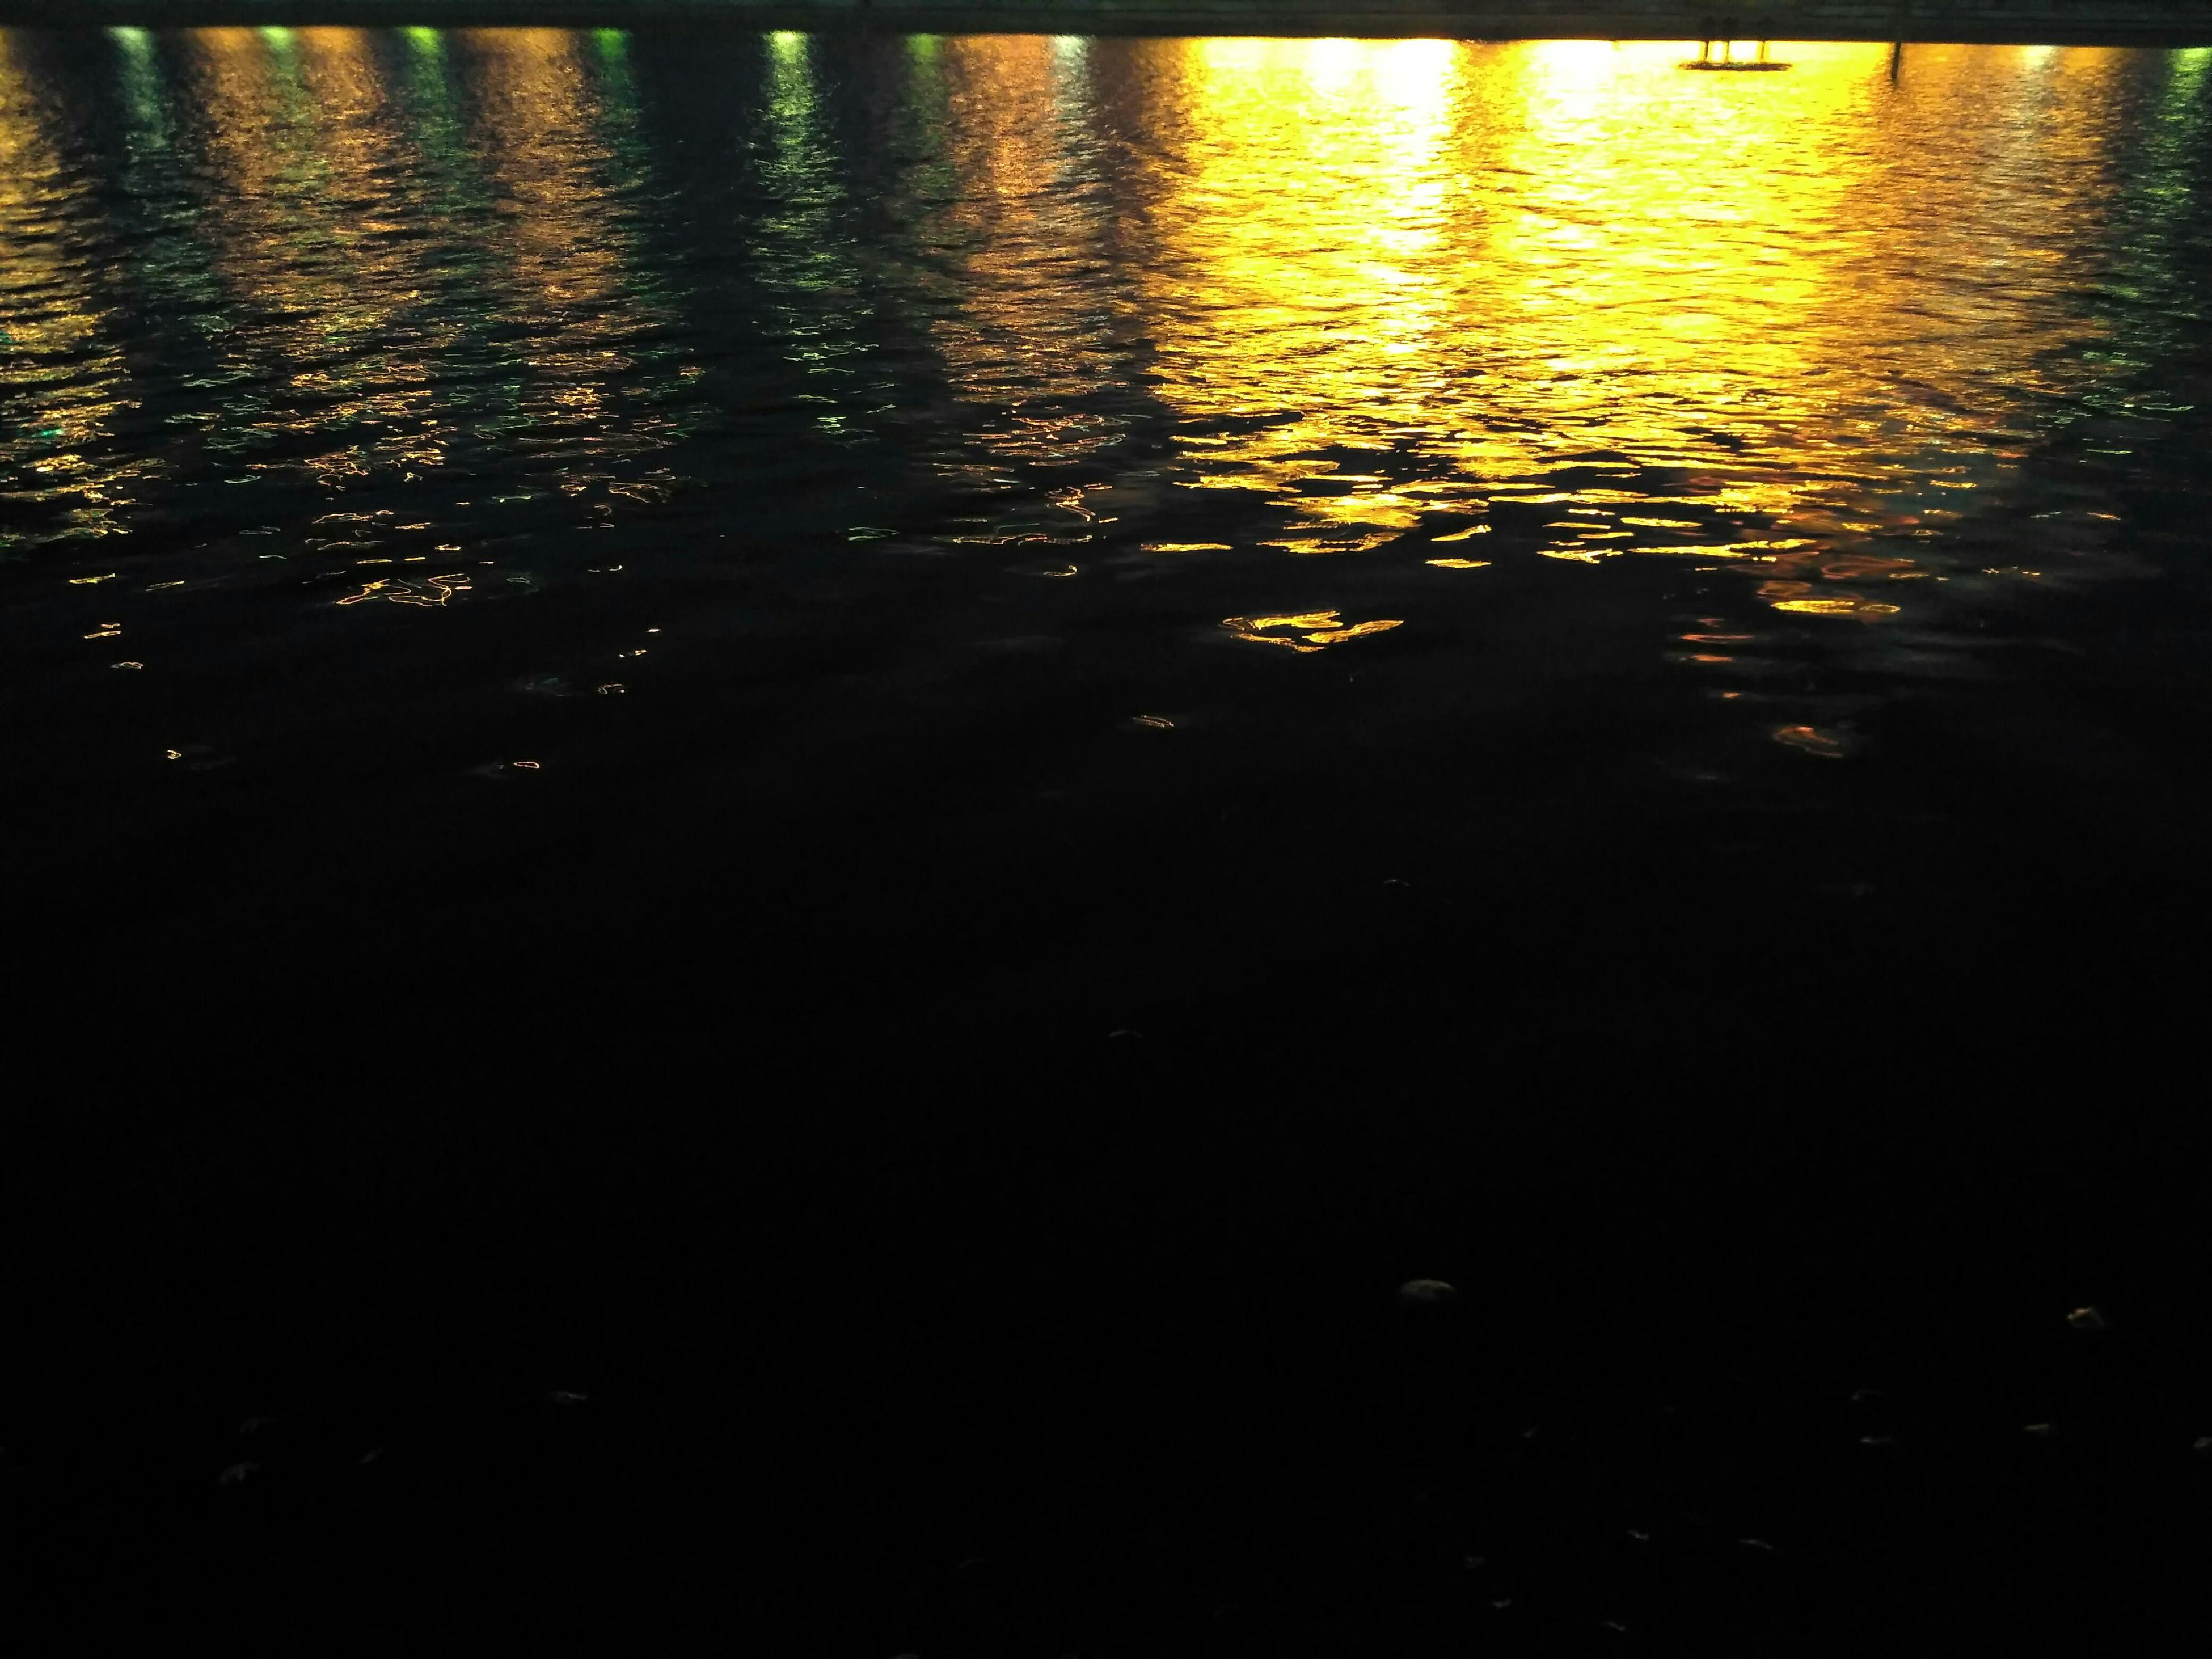 Spring City Galf Syarlights